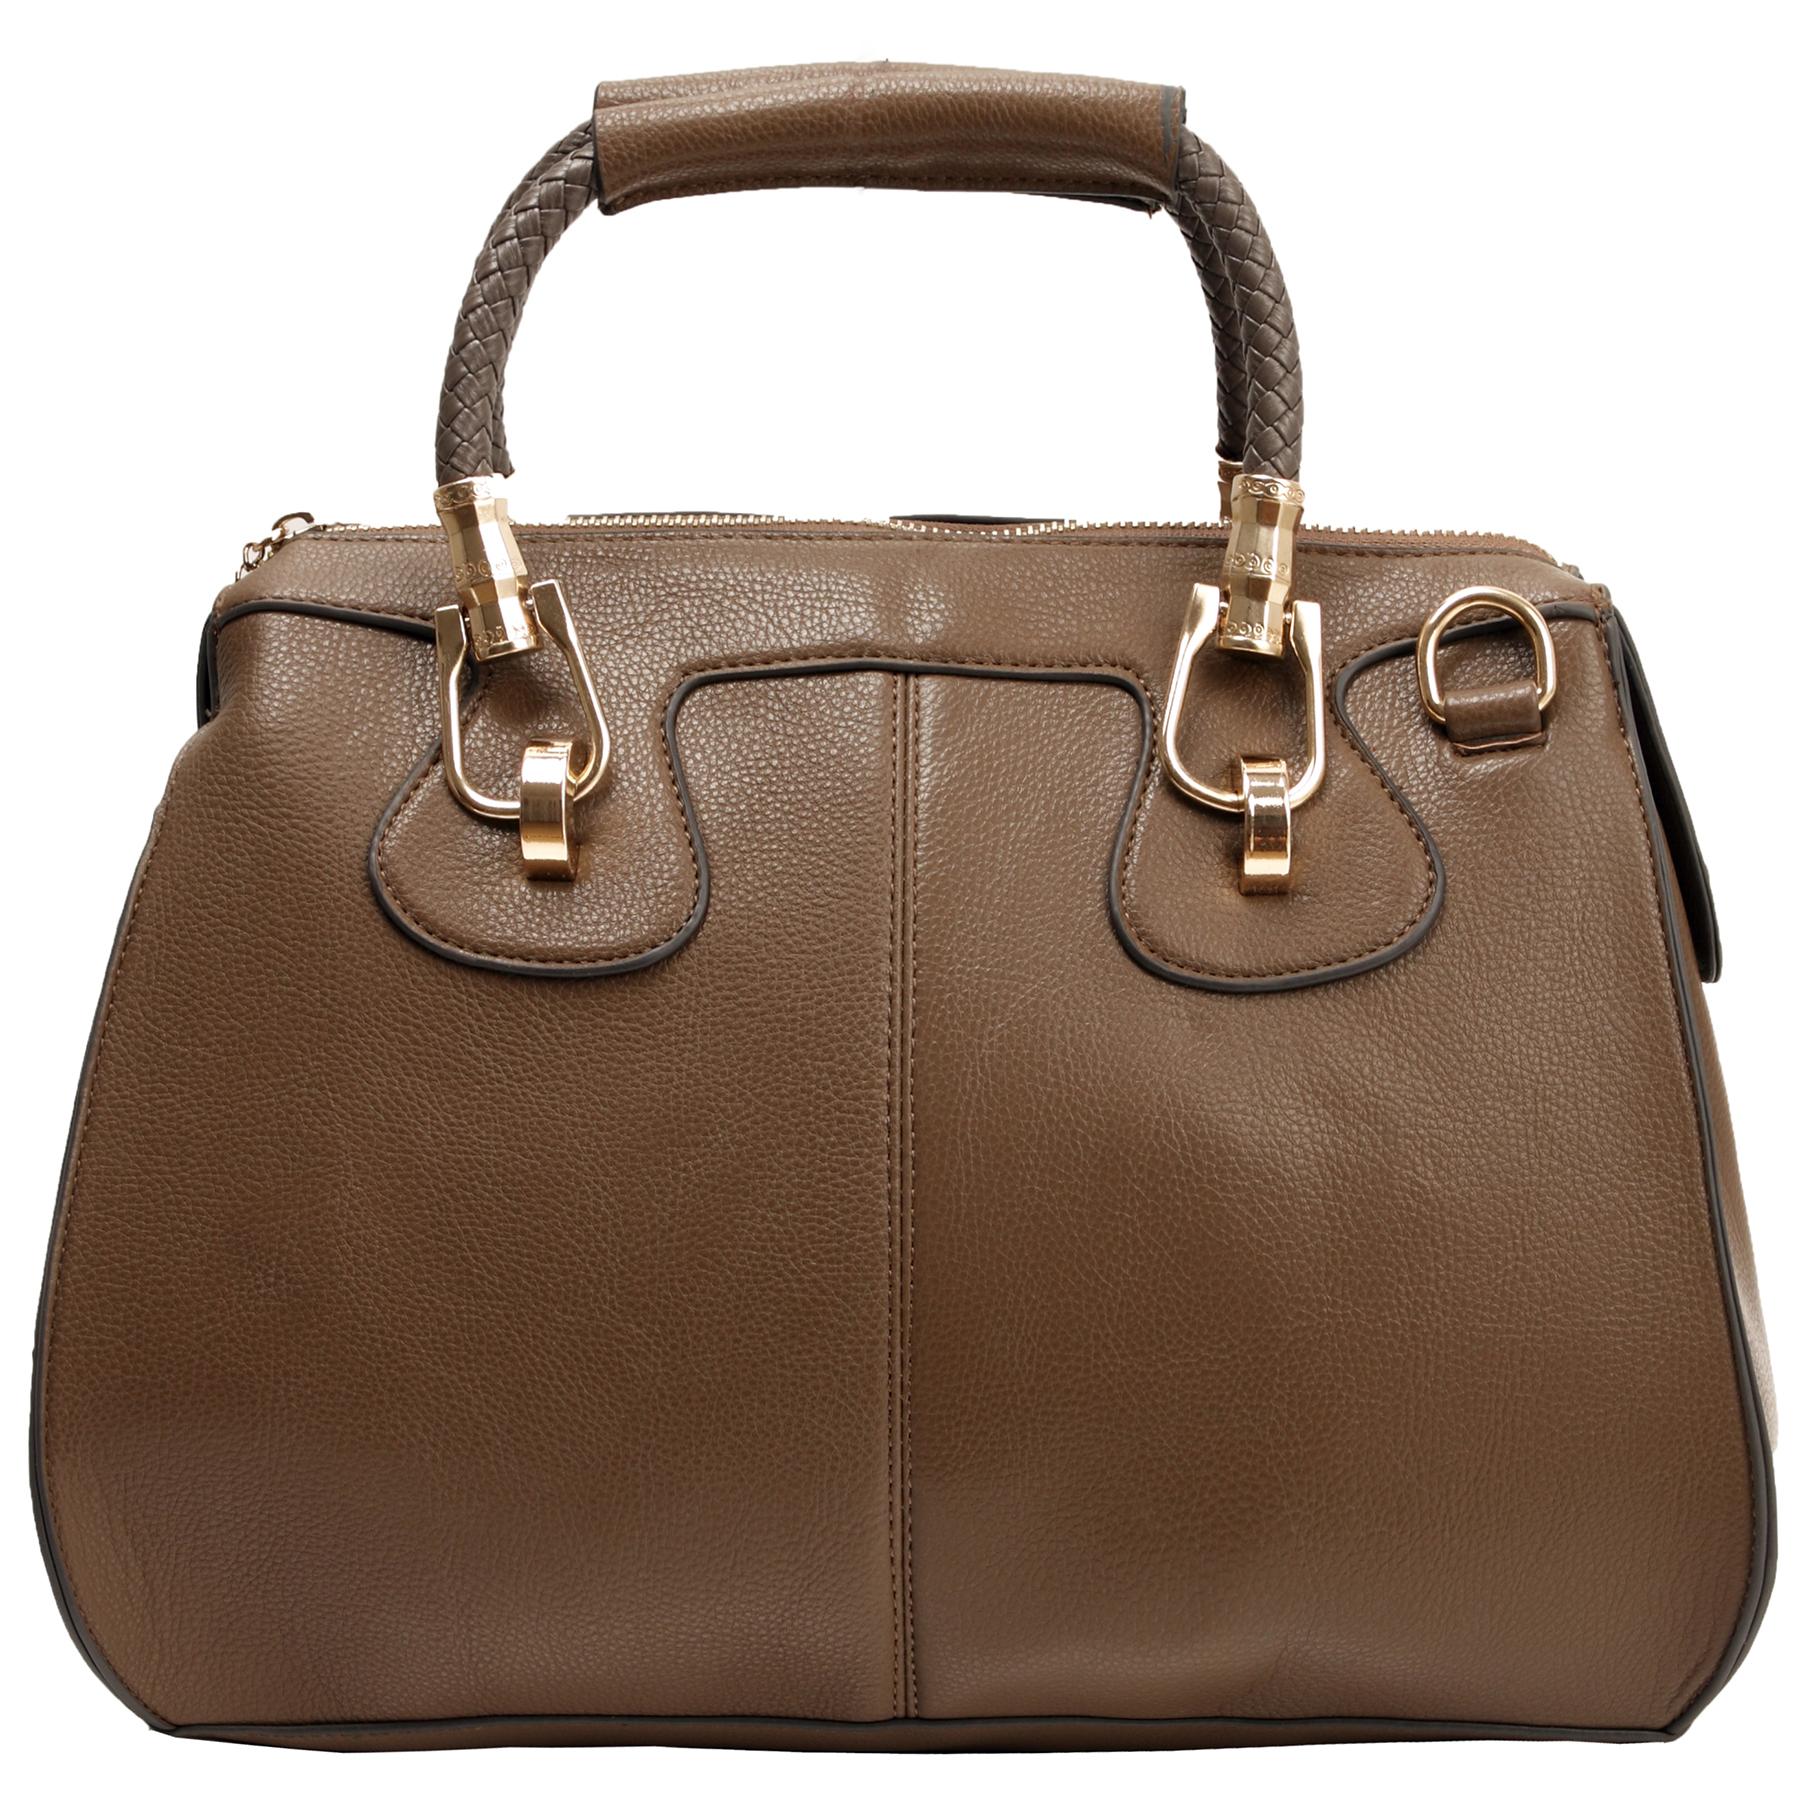 MARISSA Taupe Doctor Style Handbag Front